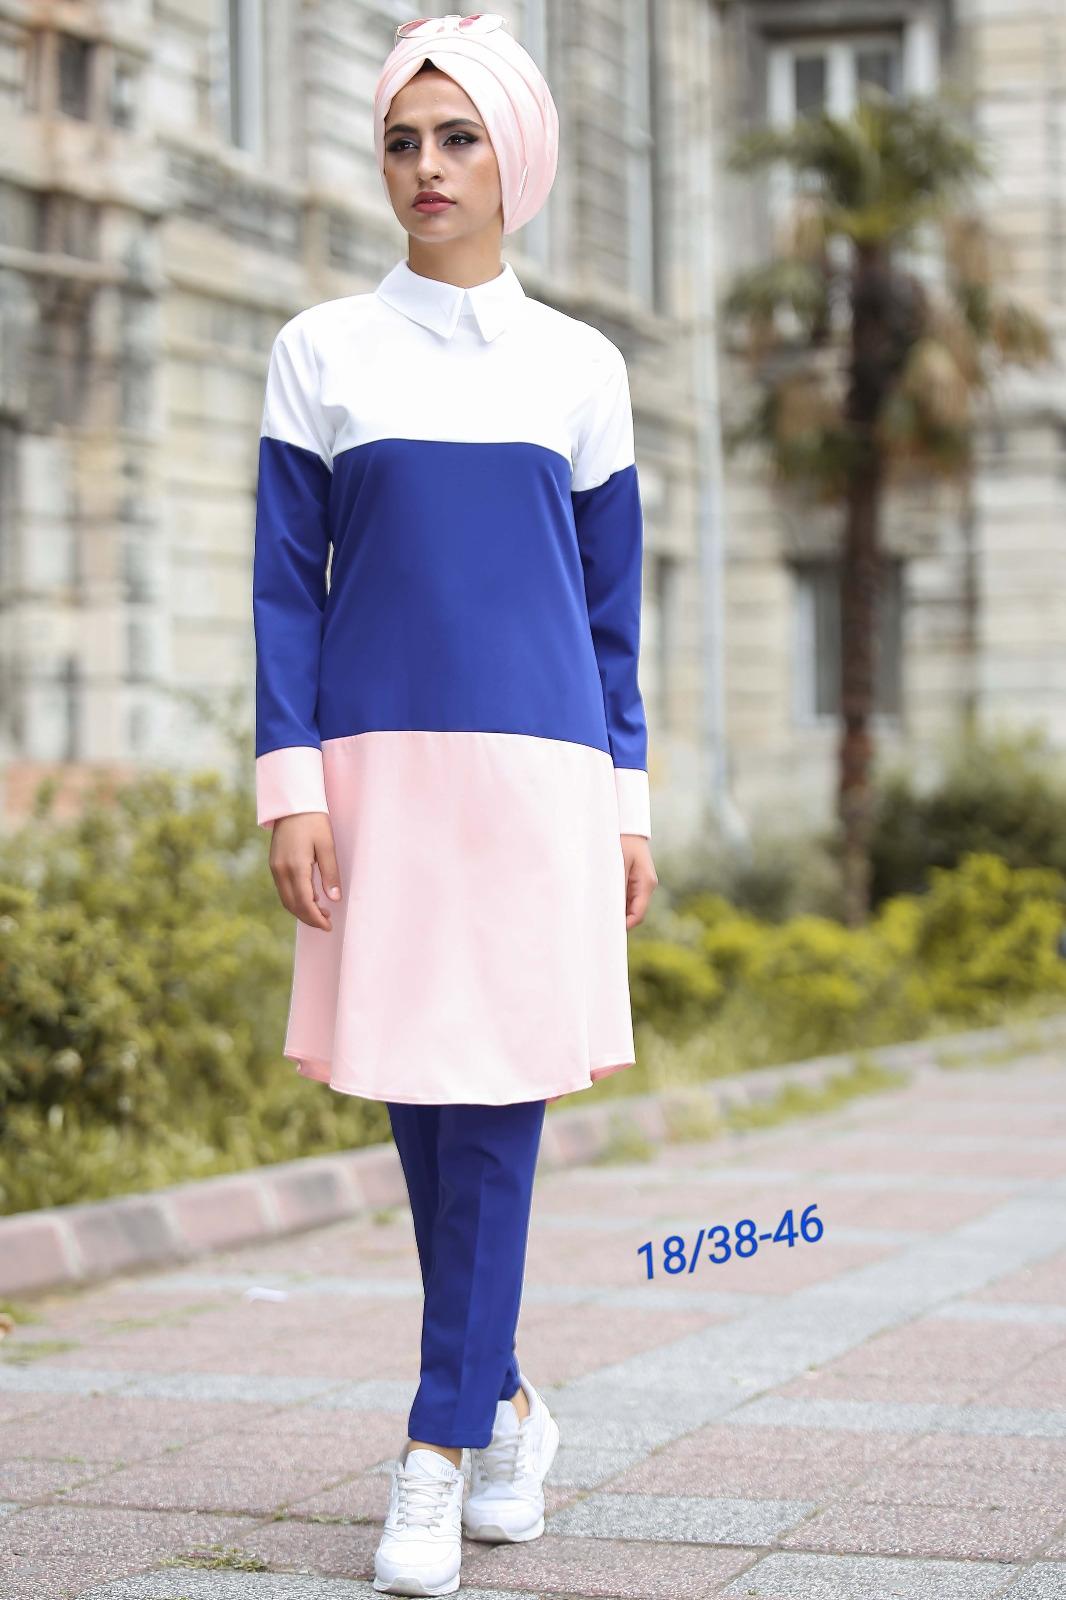 8f30144e3e9f4 ألبسة تركية جملة اجمل الازياء التركية اجمل الفساتين التركية اجمل الفساتين  التركية الطويلة اجمل الفساتين التركية للمحجبات اجمل الفساتين التركيه